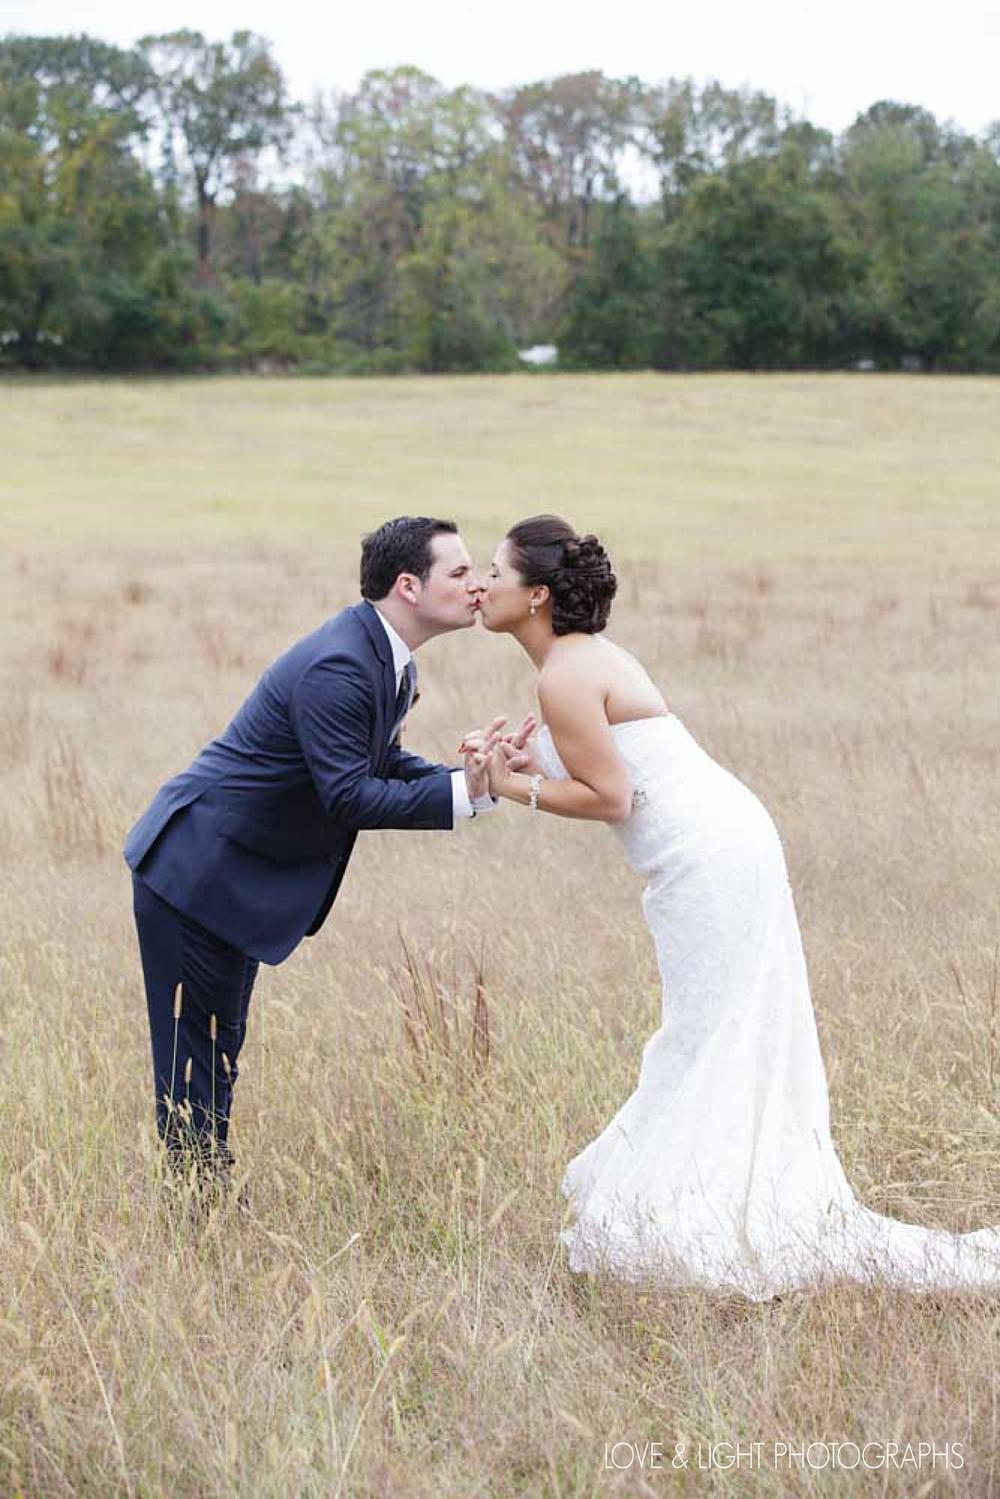 bayonet-farm-new-jersey-wedding-photographer-loveandlightphotographs-64.jpeg